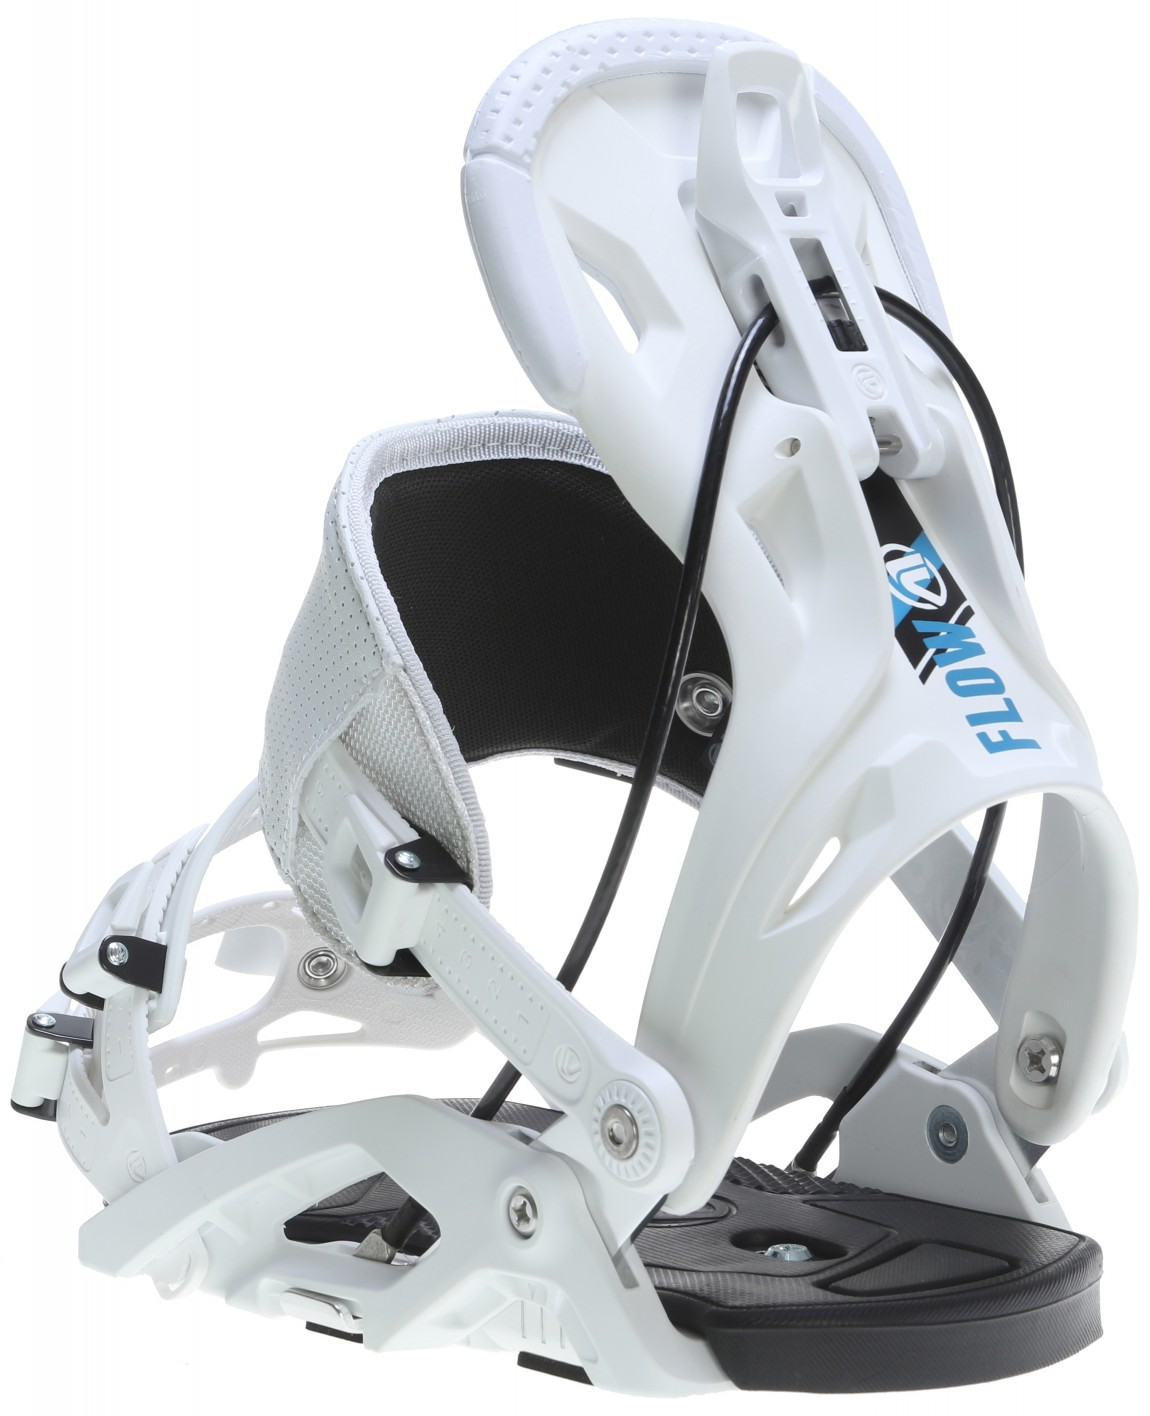 flow-nexus-hybrid-snow-bindings-white-16-1